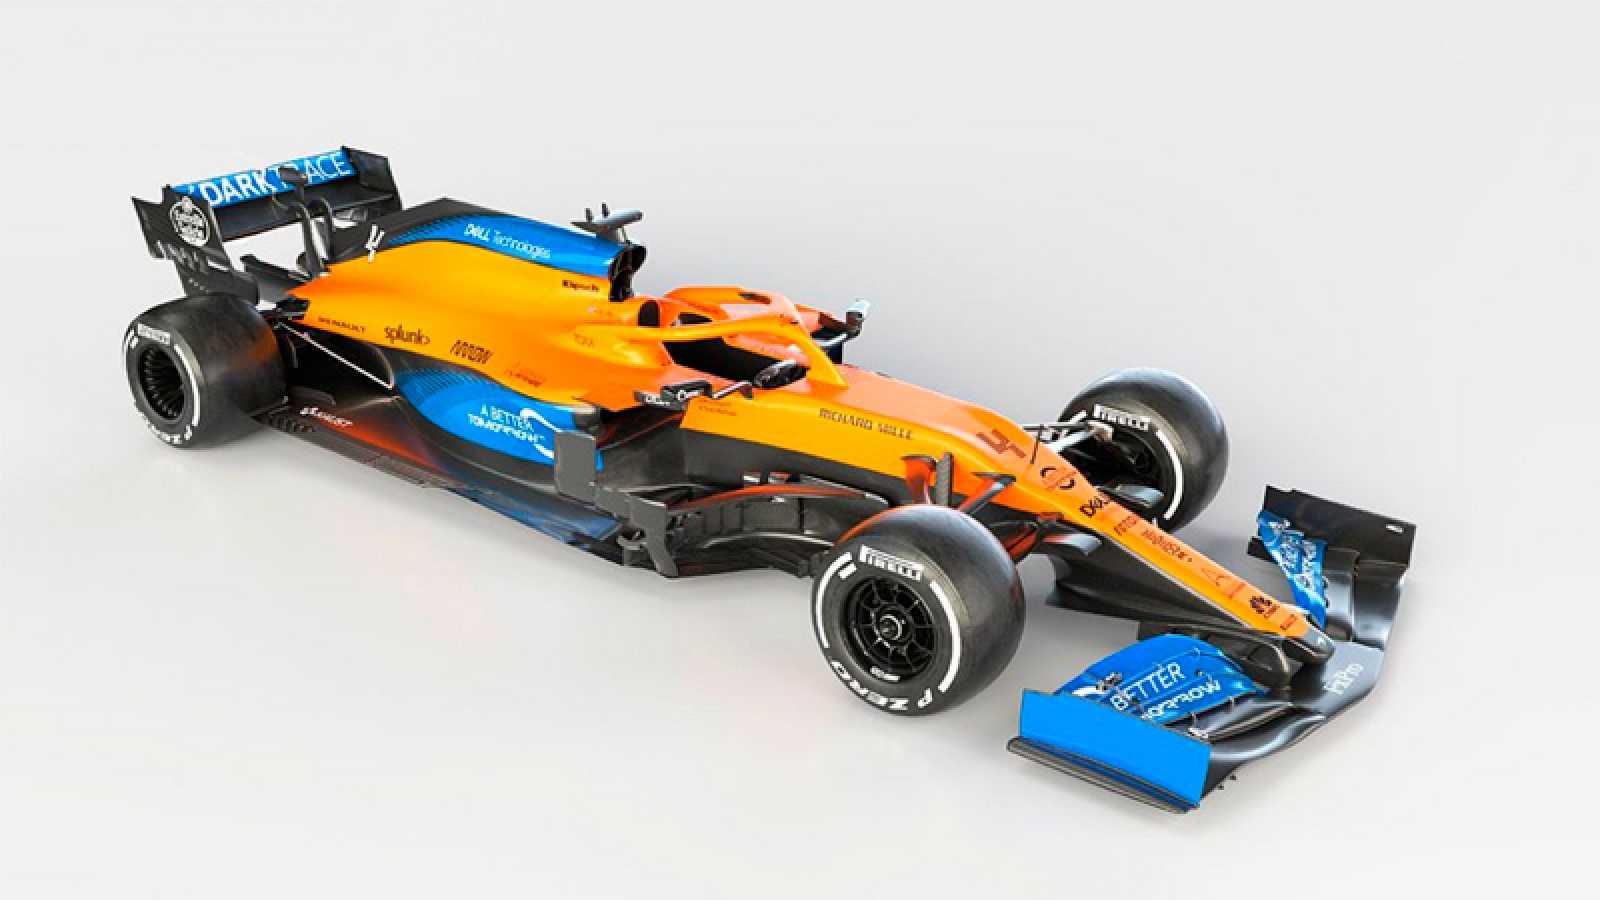 McLaren presenta su nuevo monoplaza